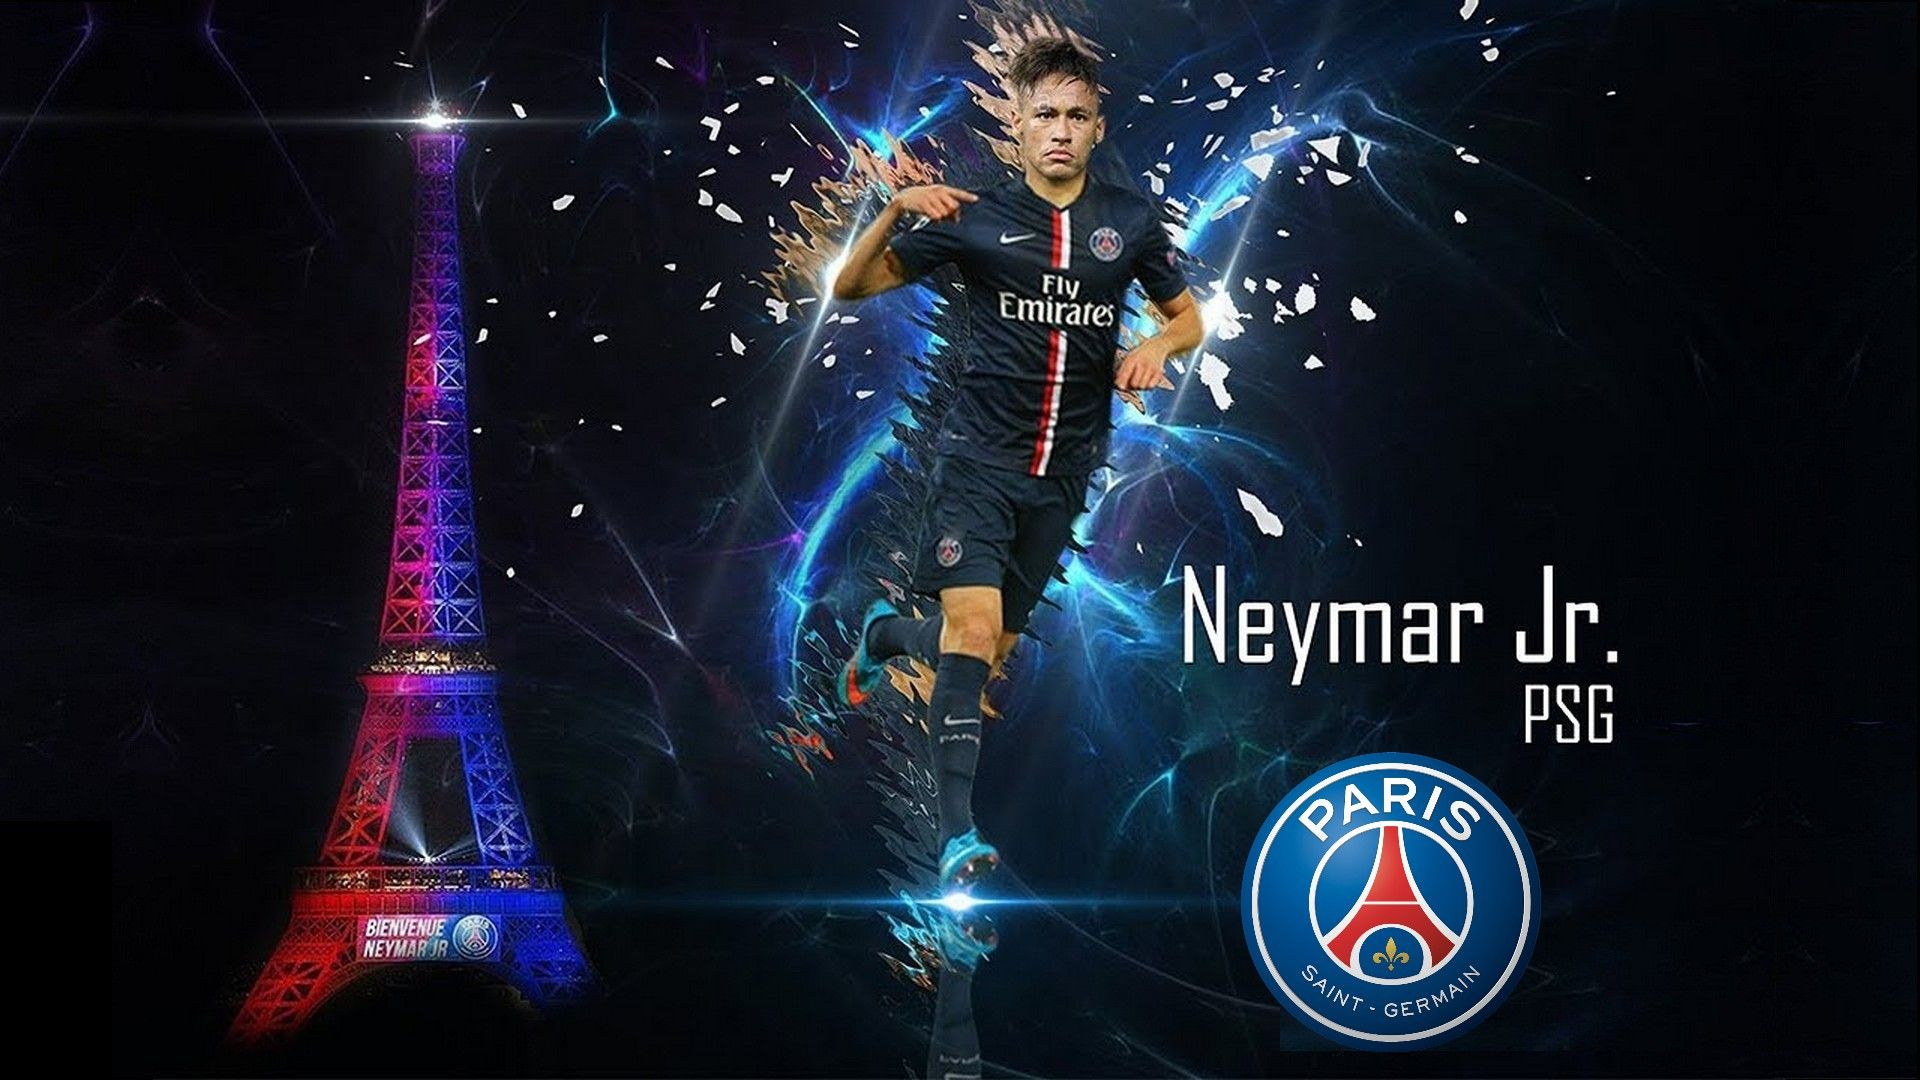 Neymar Jr 2021 HD Wallpapers - Wallpaper Cave